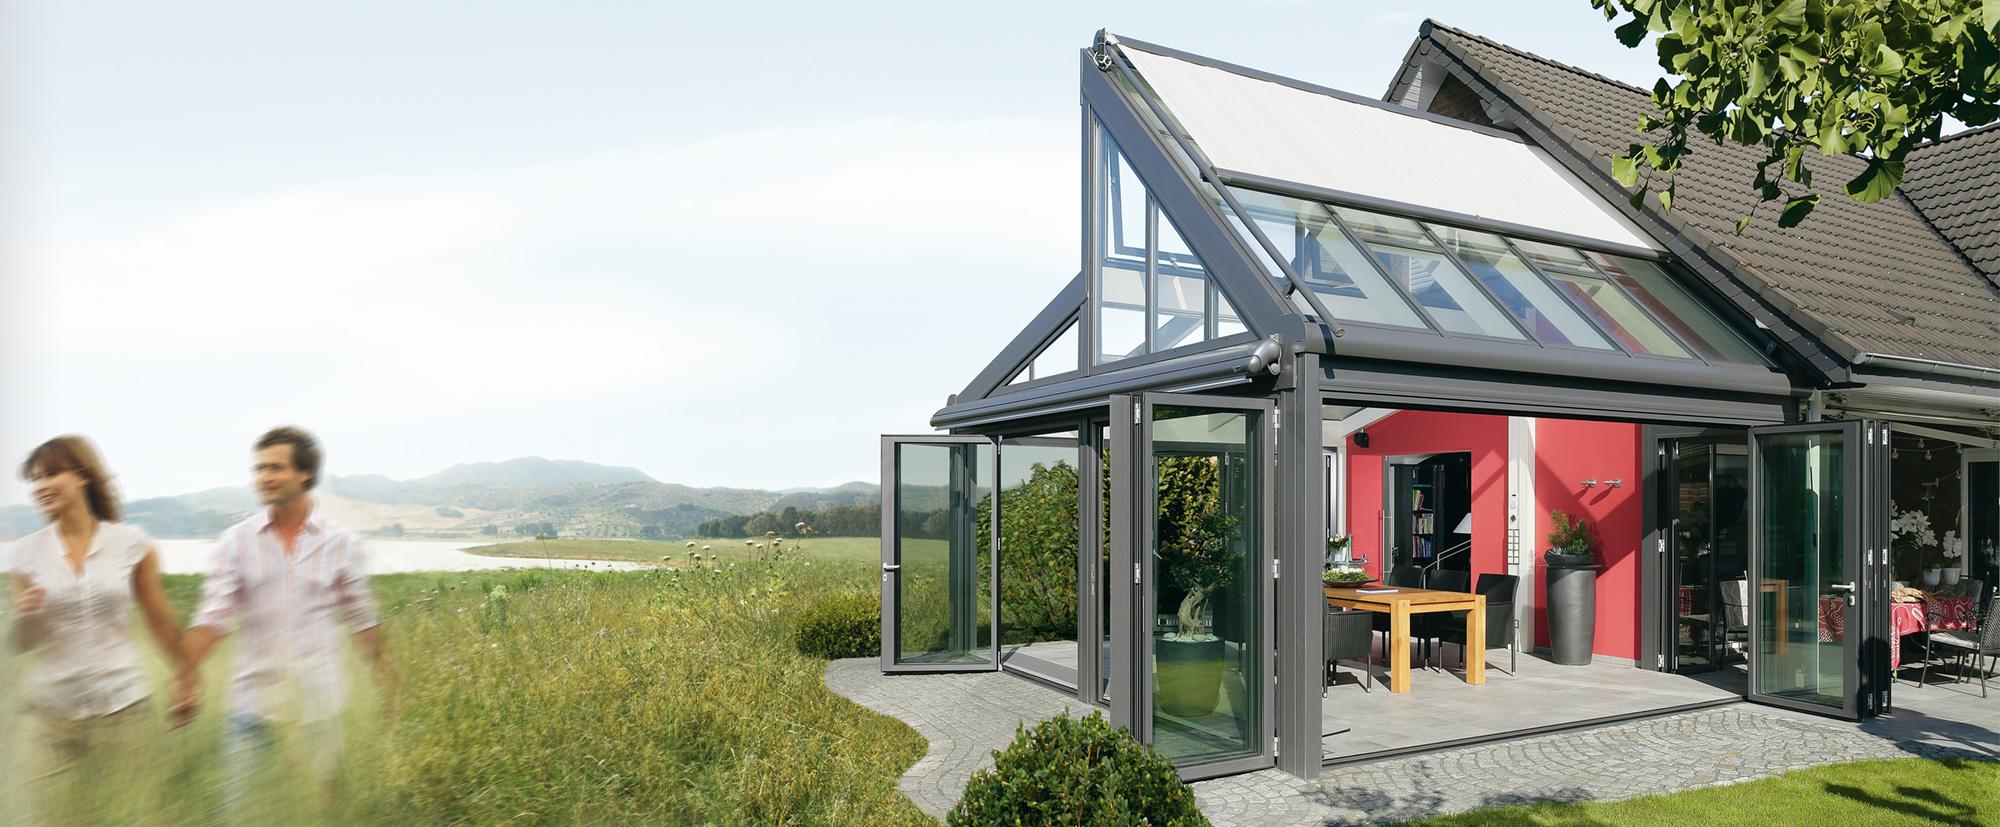 solarlux overview spectrum architectural glazing